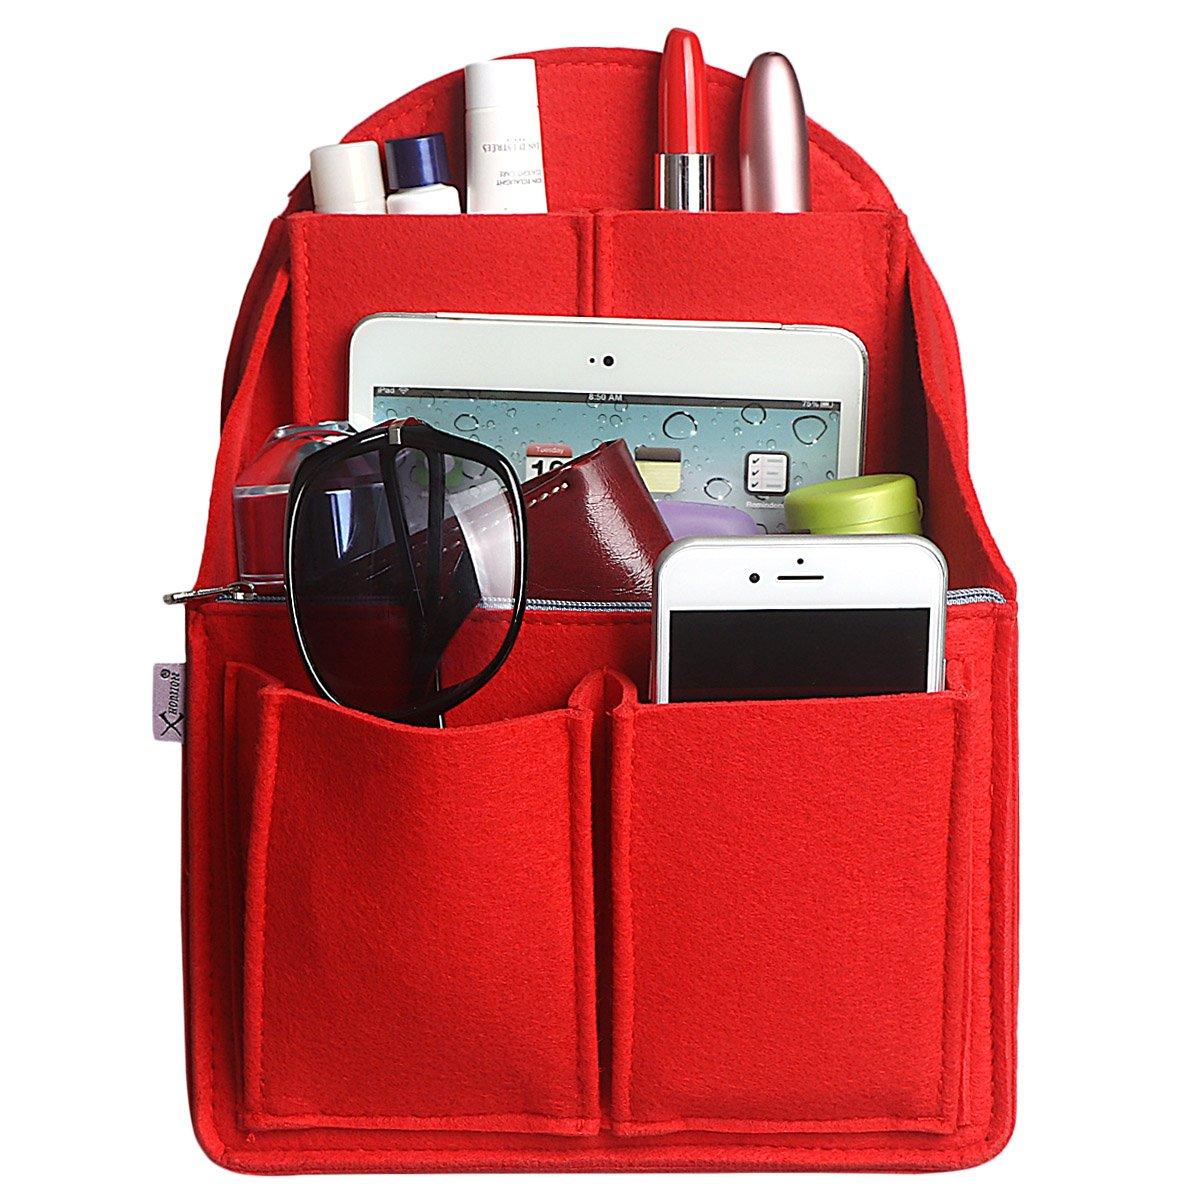 Xidan Handbag Organiser, Fabric Bag Organizer with Felt Handbag Shape, Multi-Pocket Pocket Pocket Backpack Purse and Travel Backpack Bag in Bag Organizer, Beige